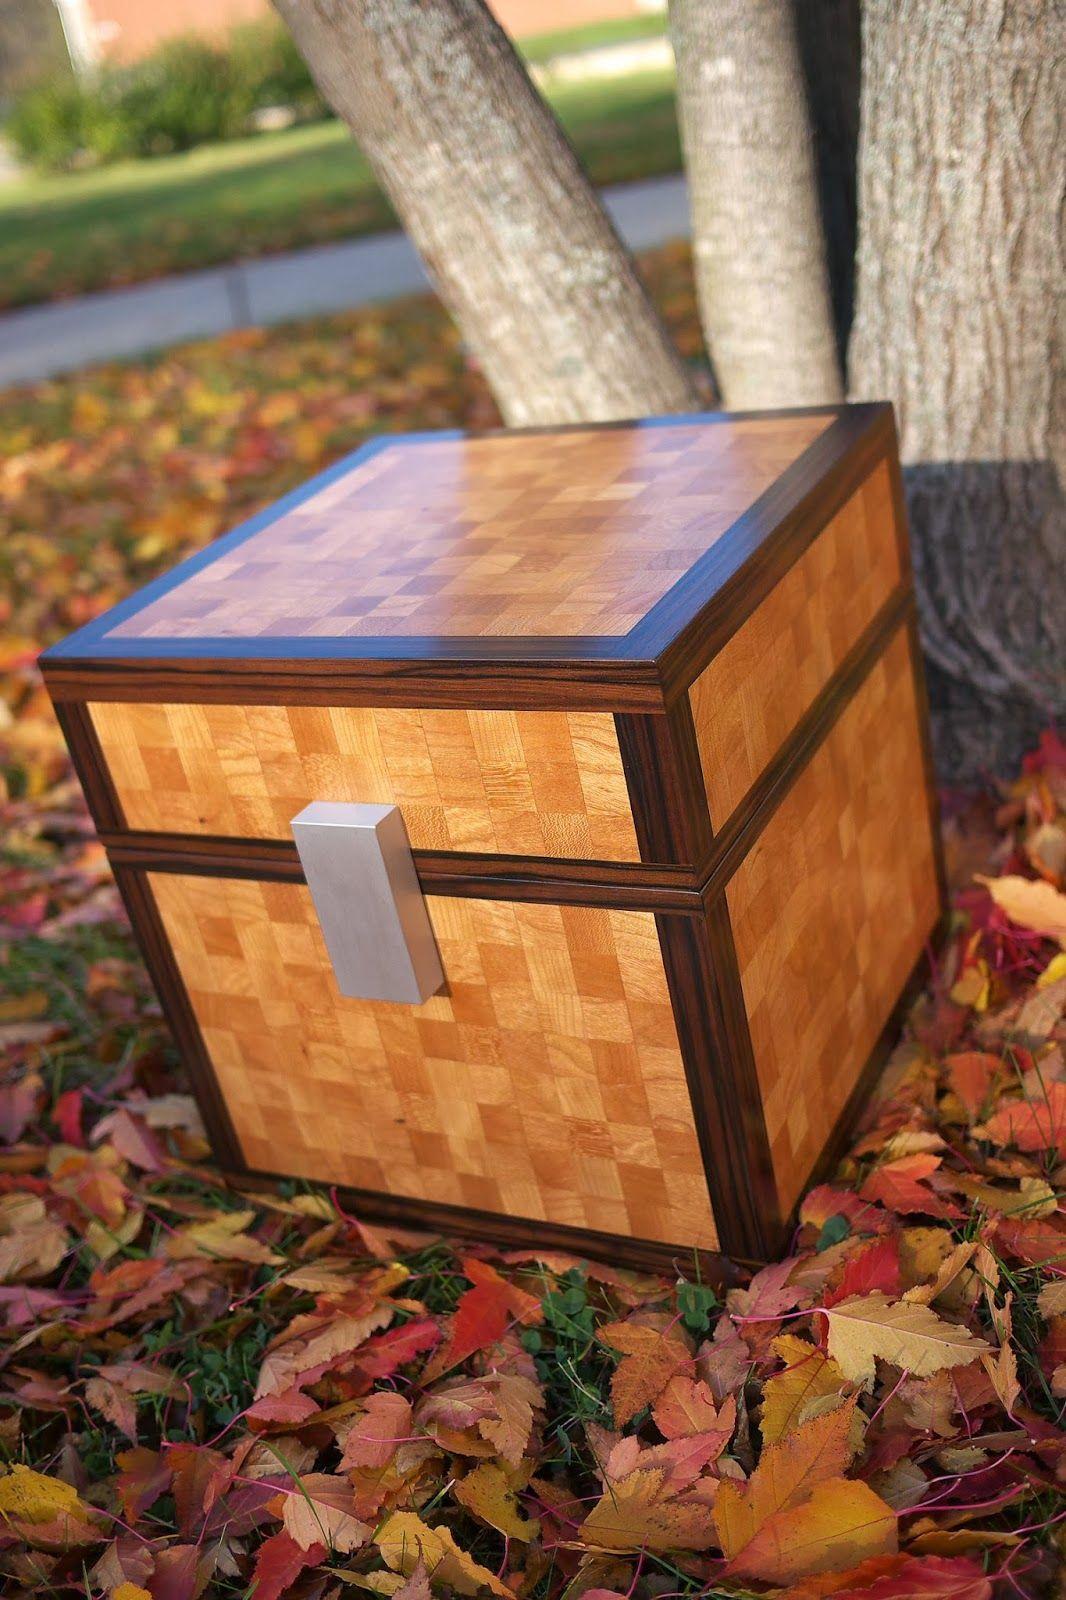 Charming Petit Coffre Minecraft Kid Bedroom Furniture Item Sets Diy